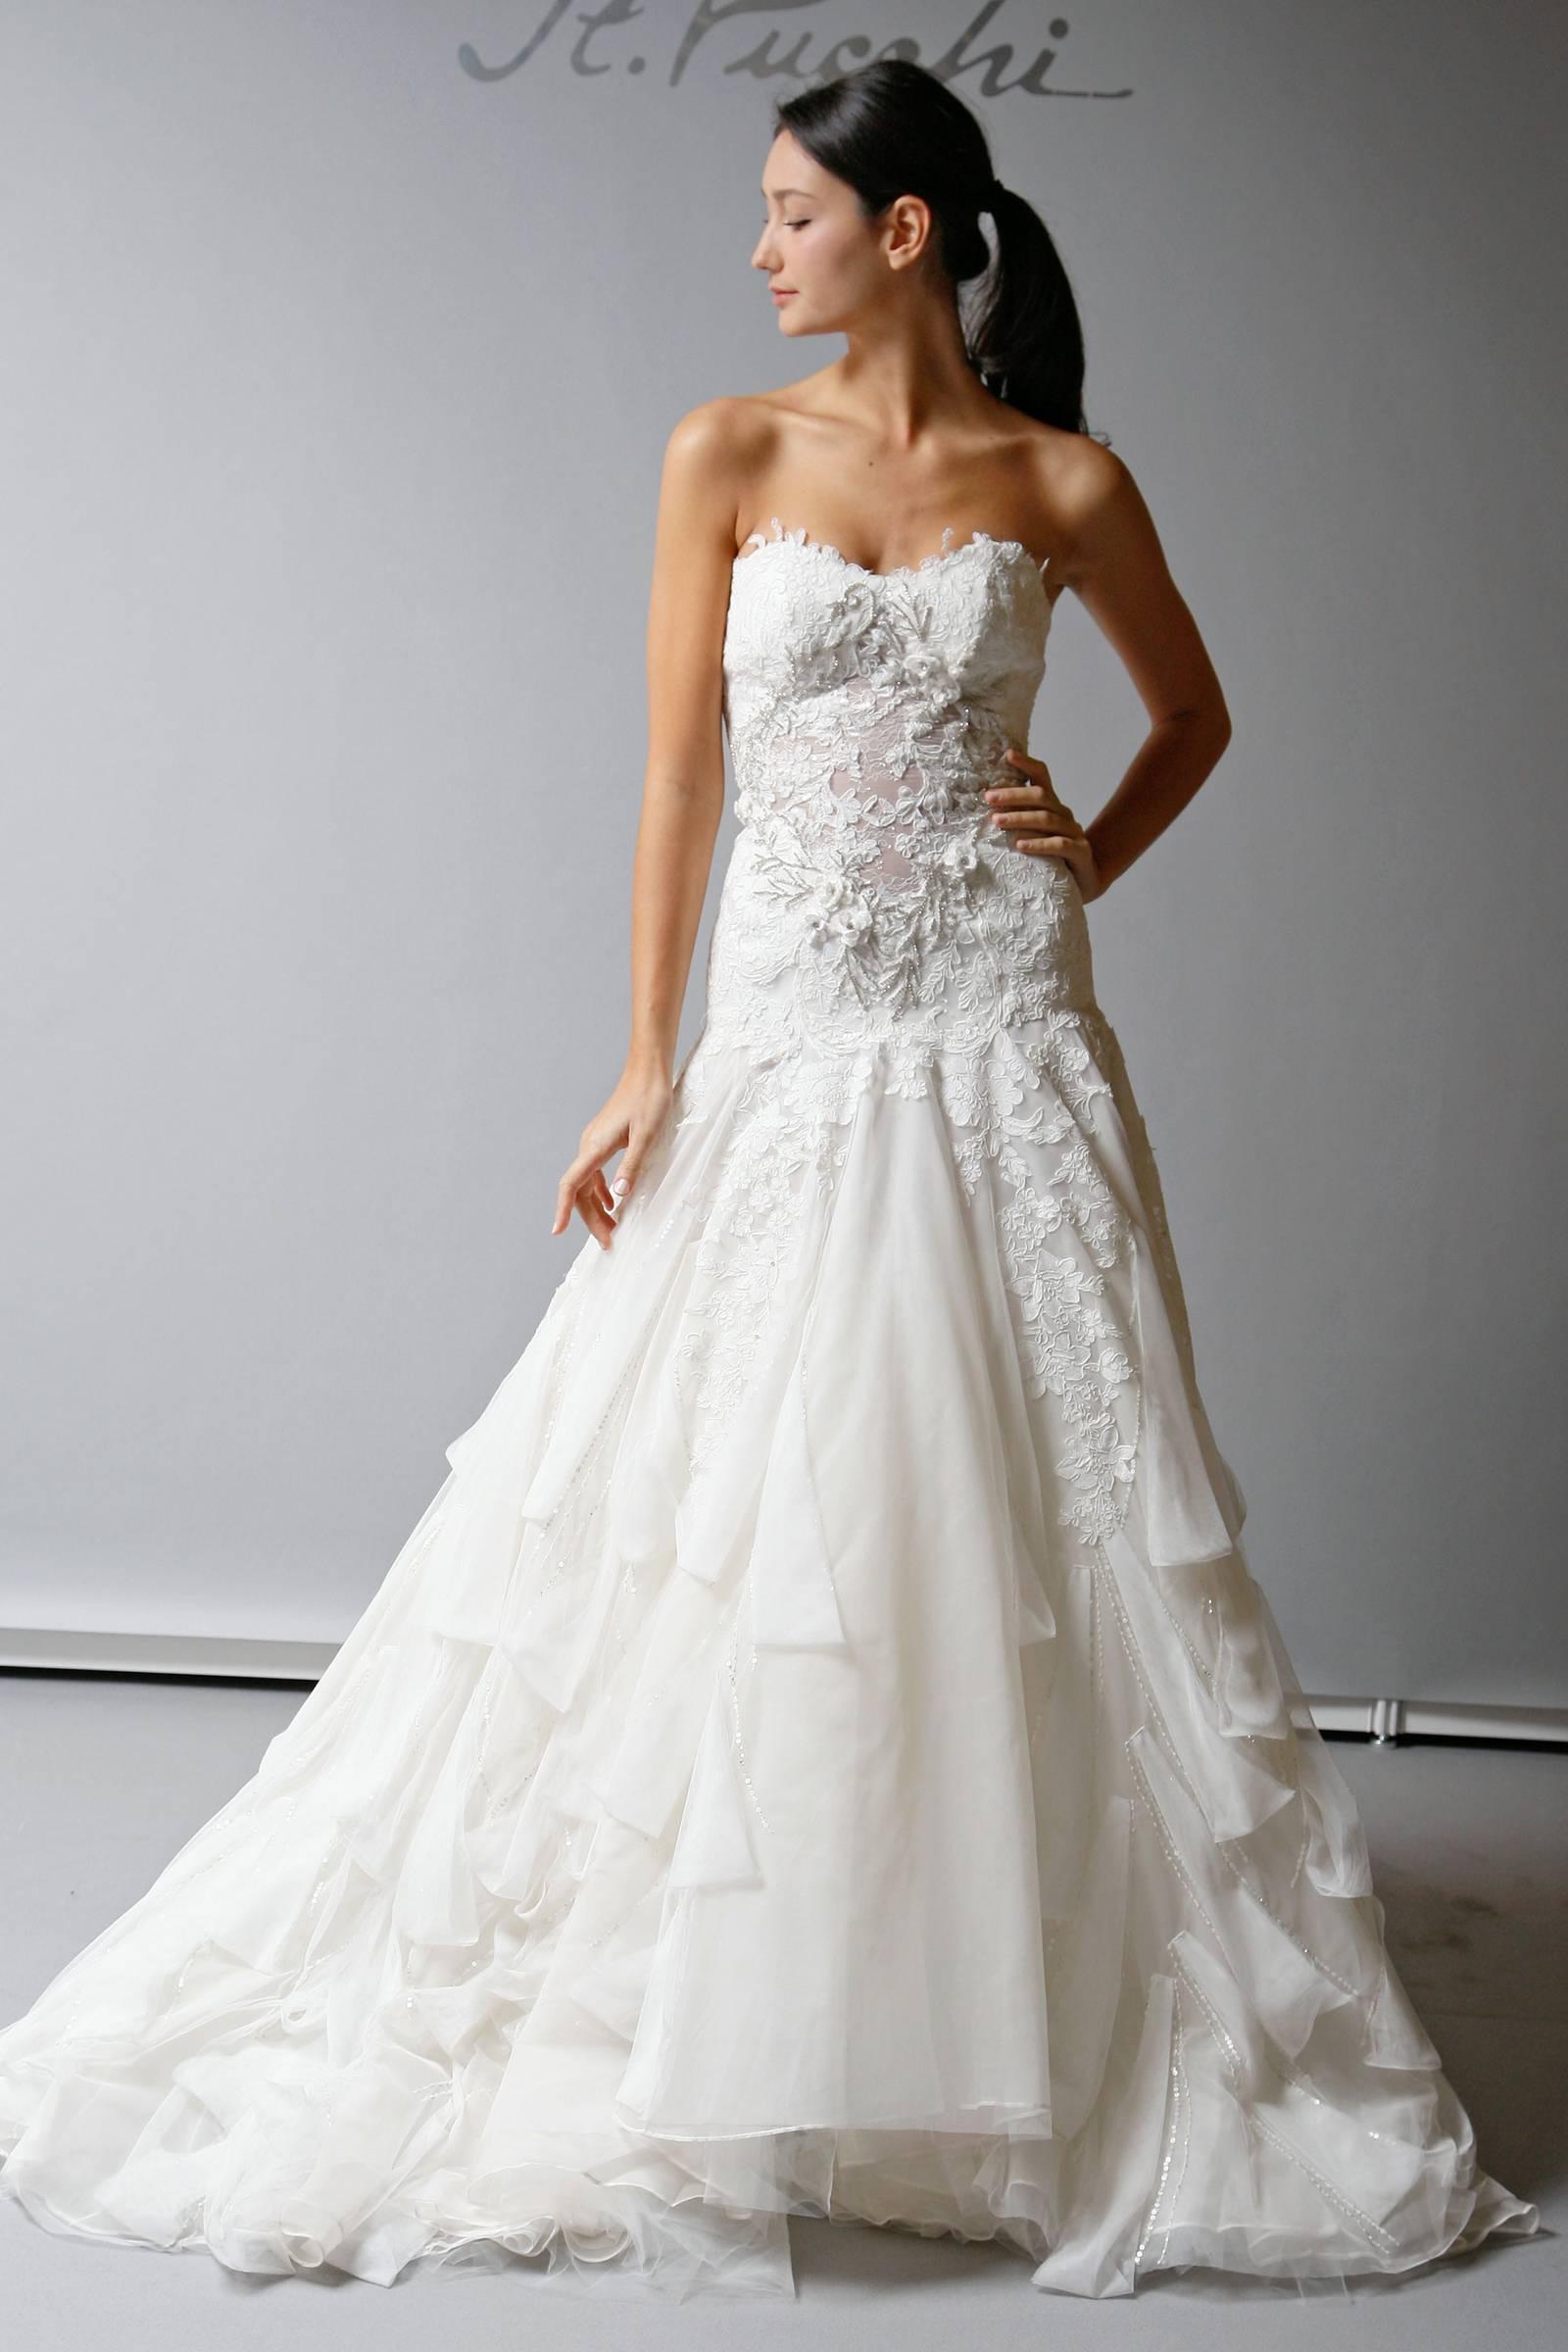 2013 wedding dress st pucchi bridal drop waist strapless for Wedding dress pictures 2013